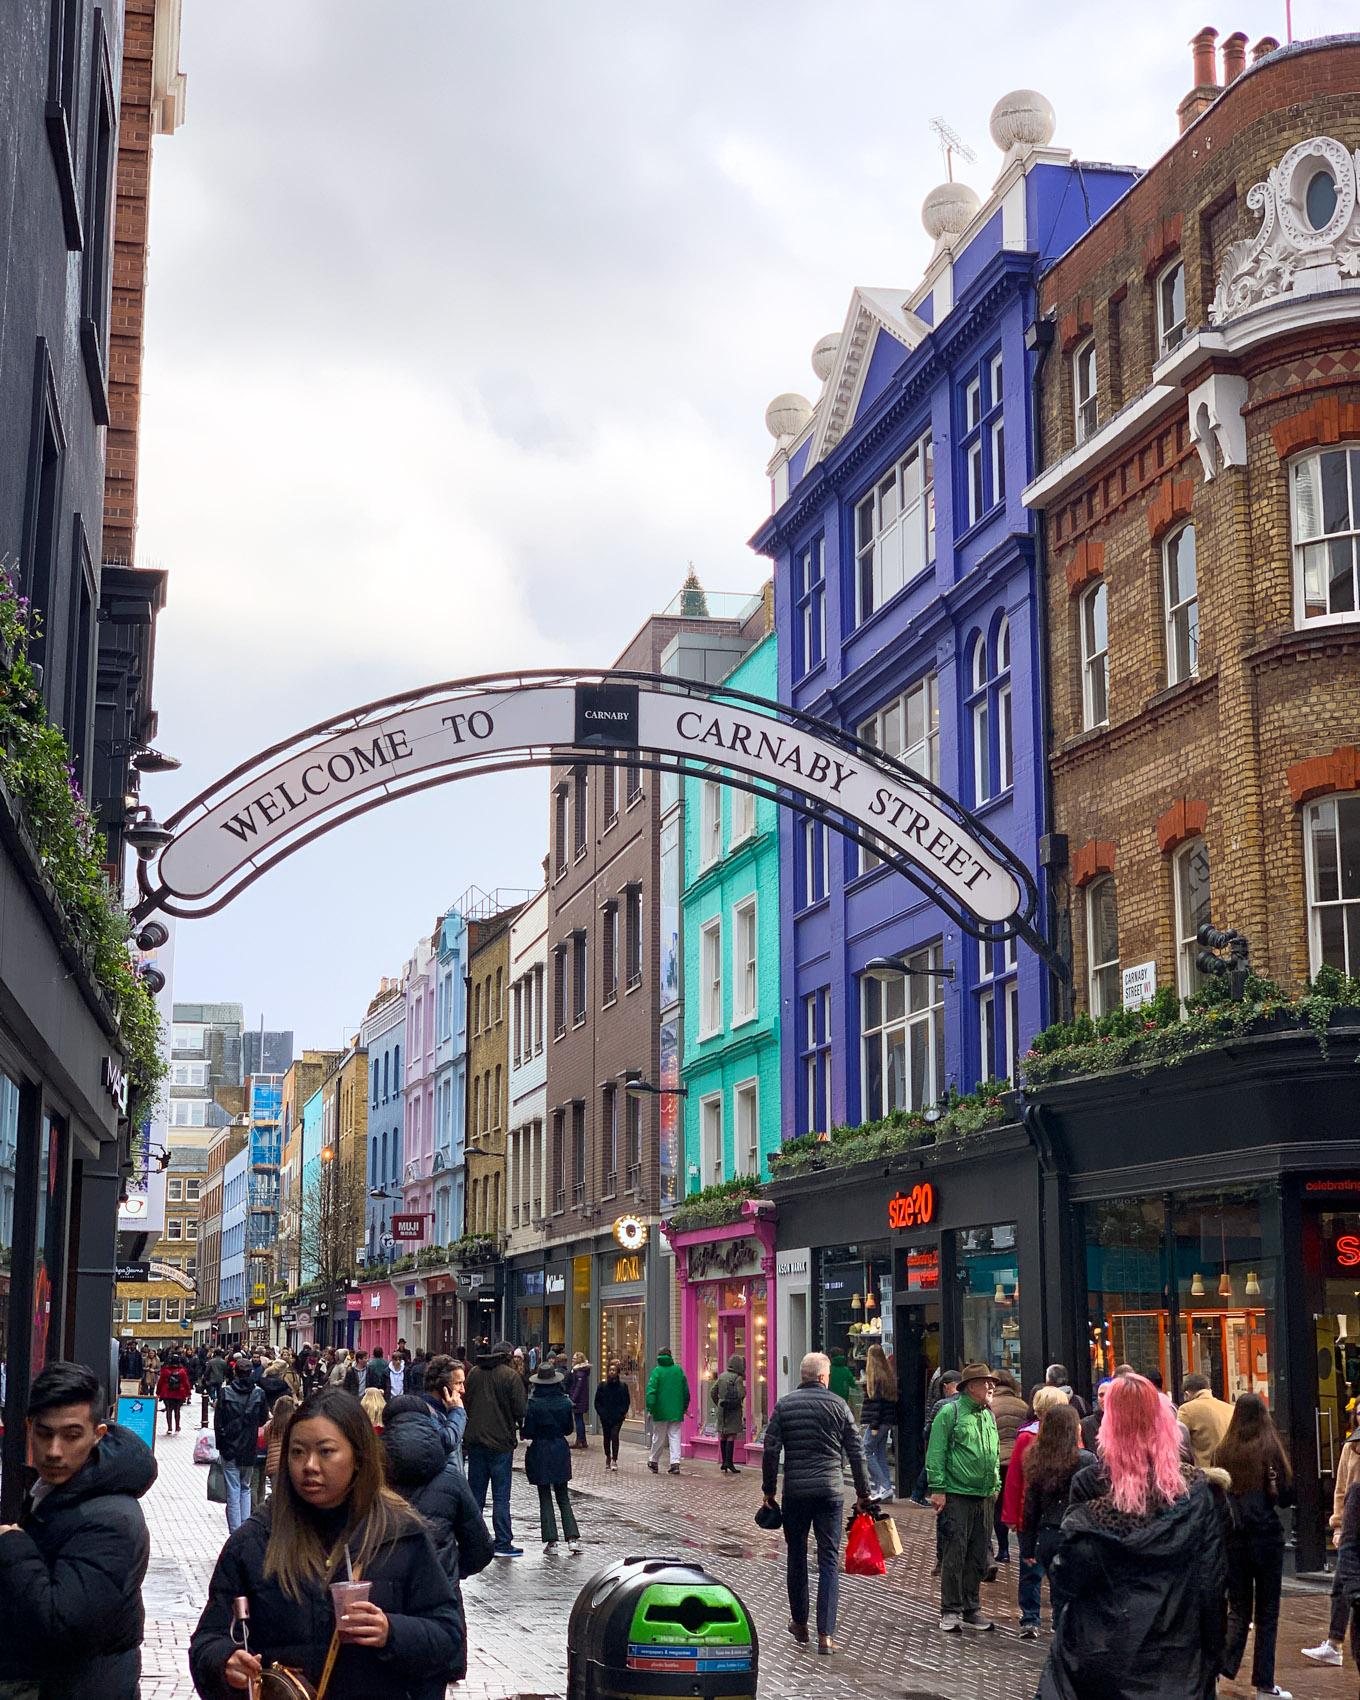 Lontoo - London - Carnaby Street